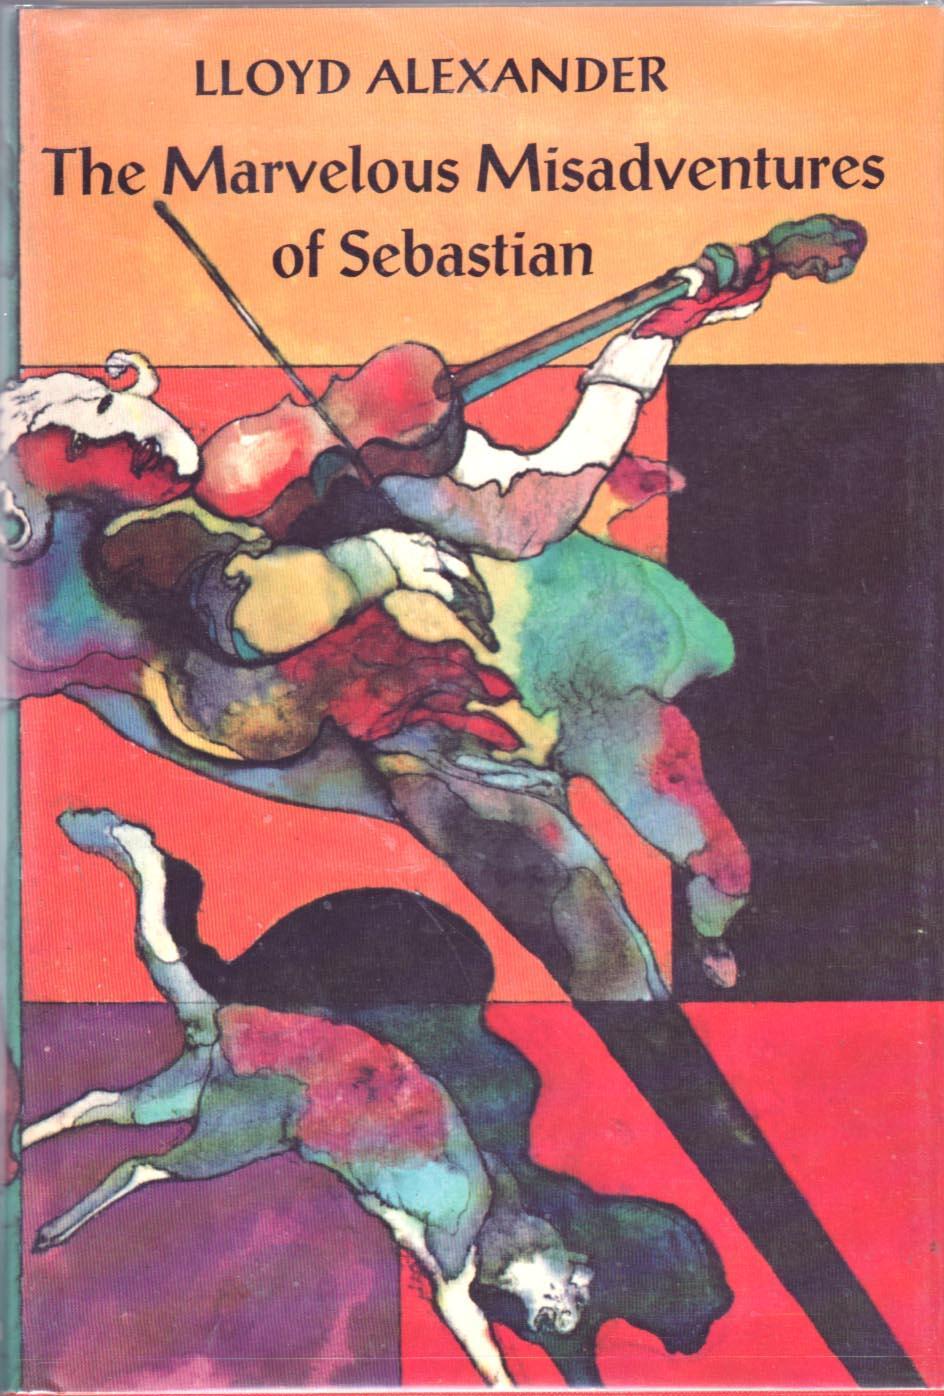 cover of The Marvelous Misadventures of Sebastian by Lloyd Alexander